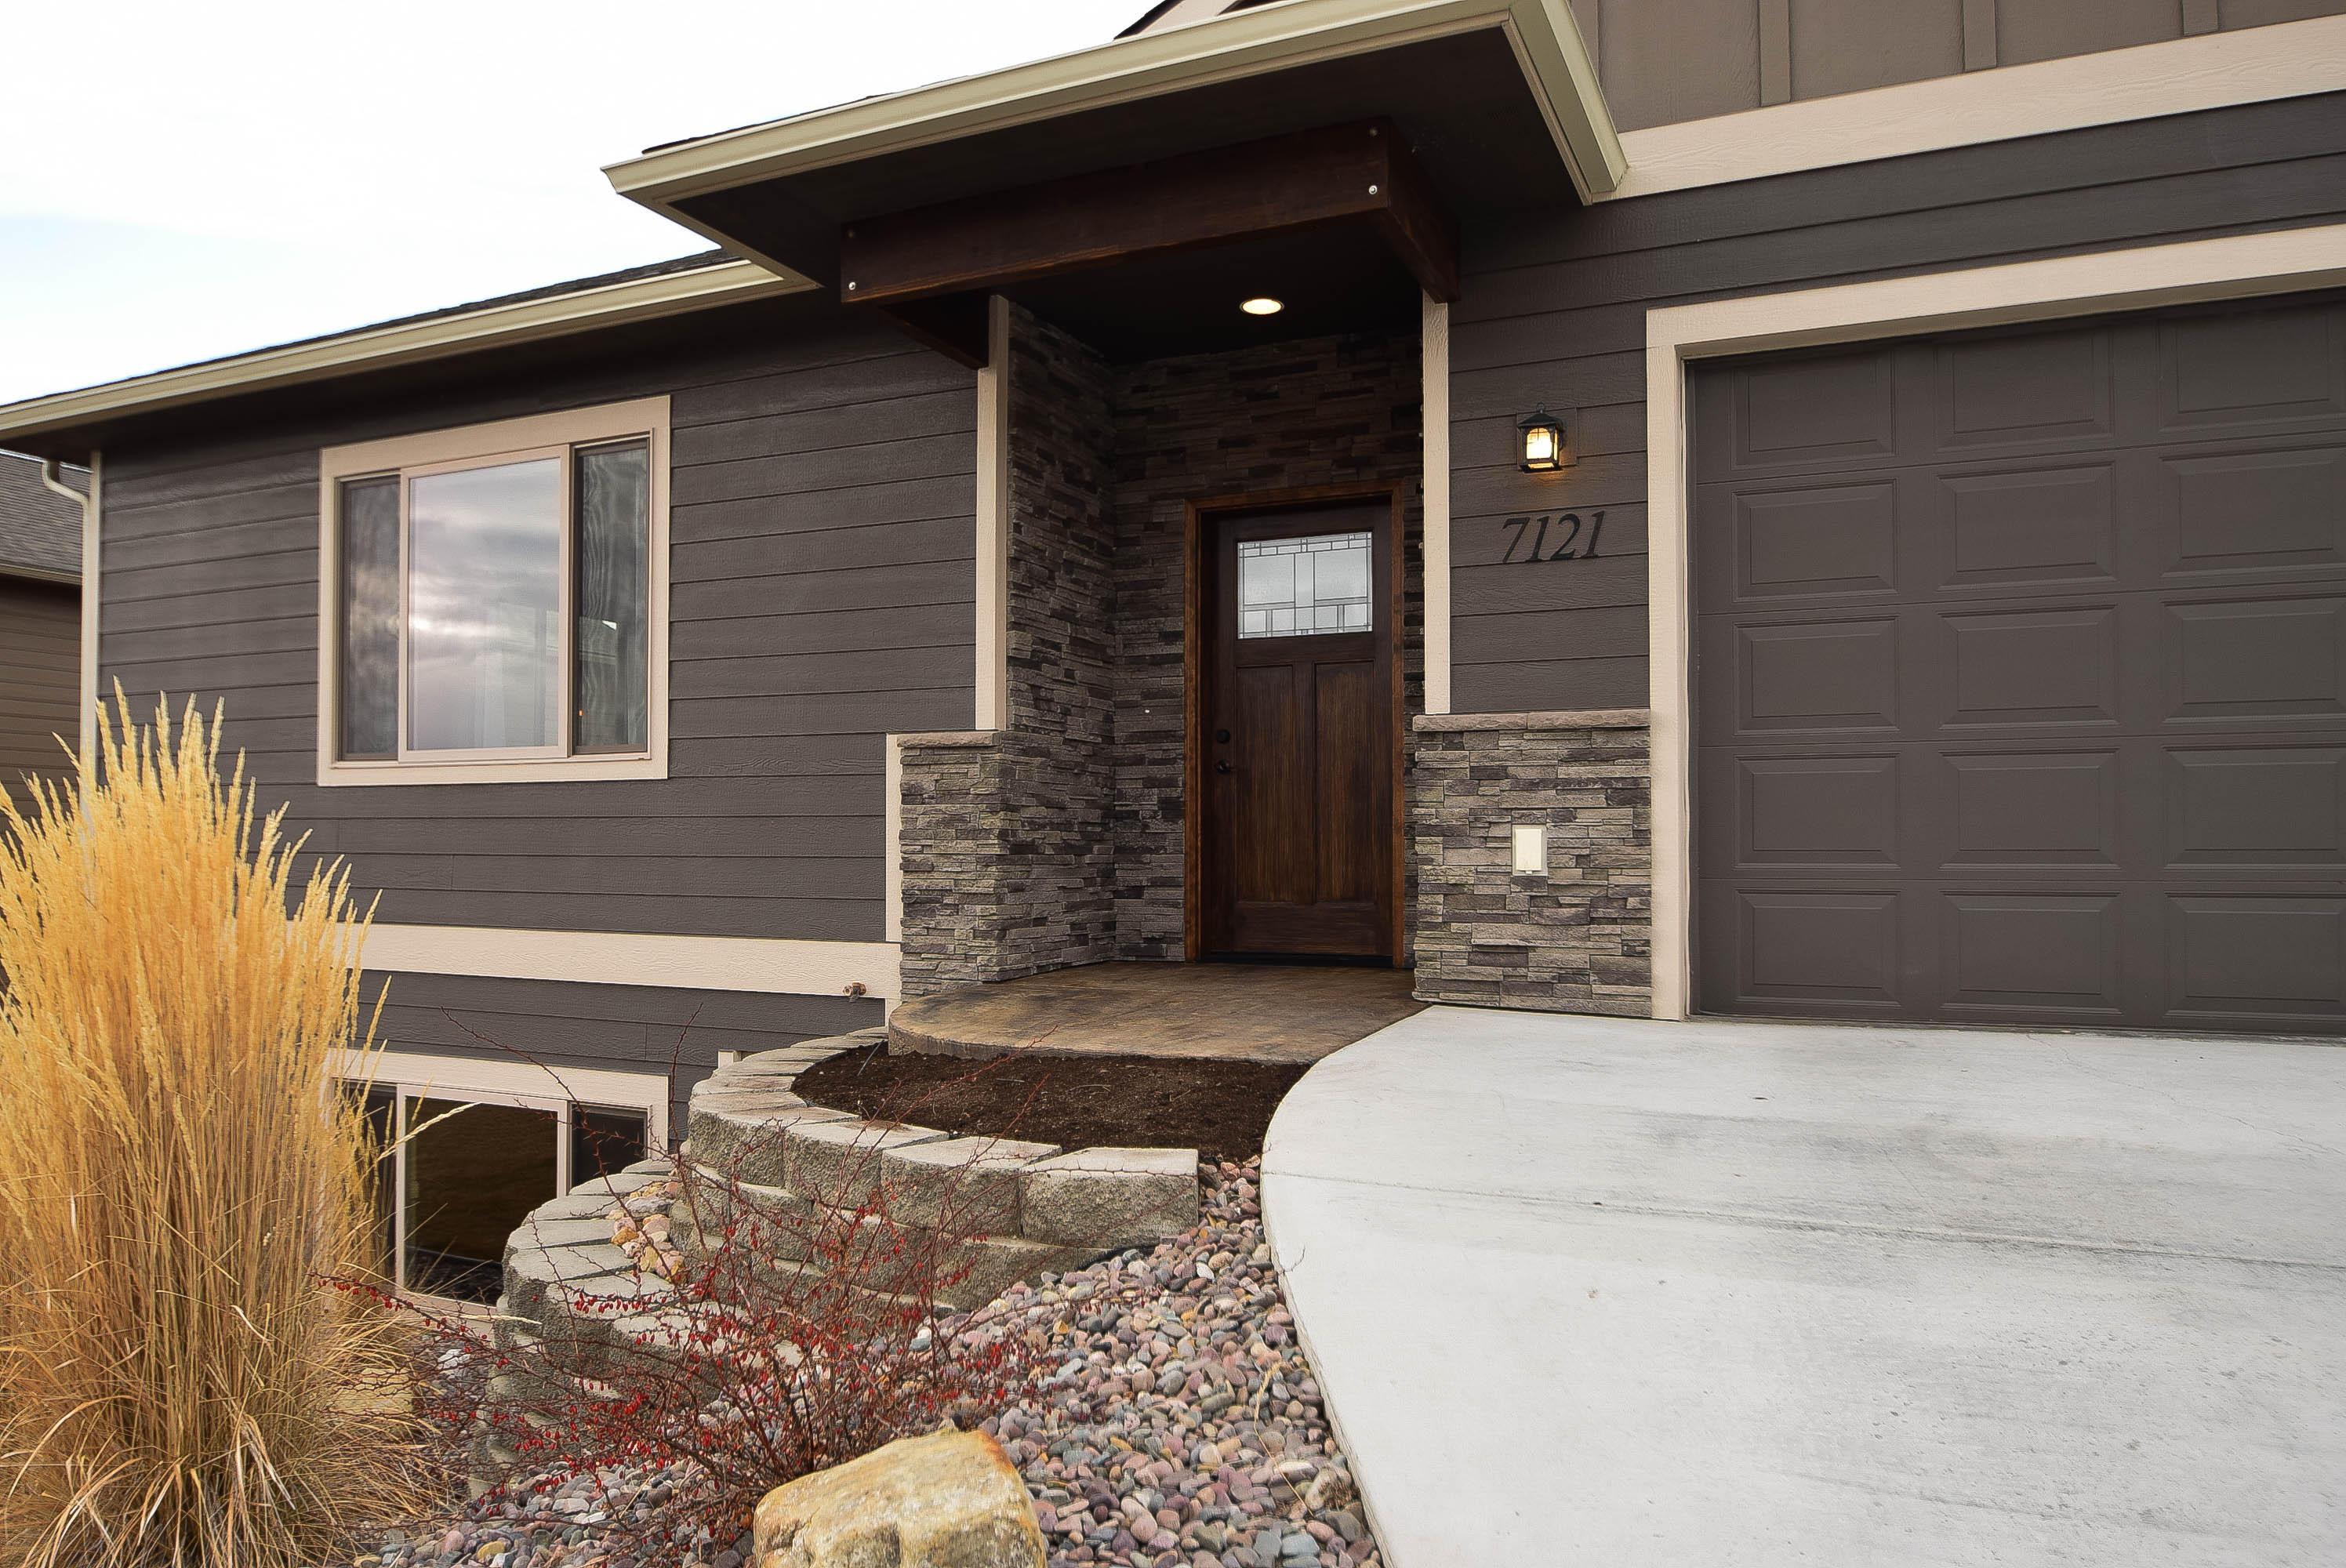 7121 Avery Lane, Missoula, MT 59803